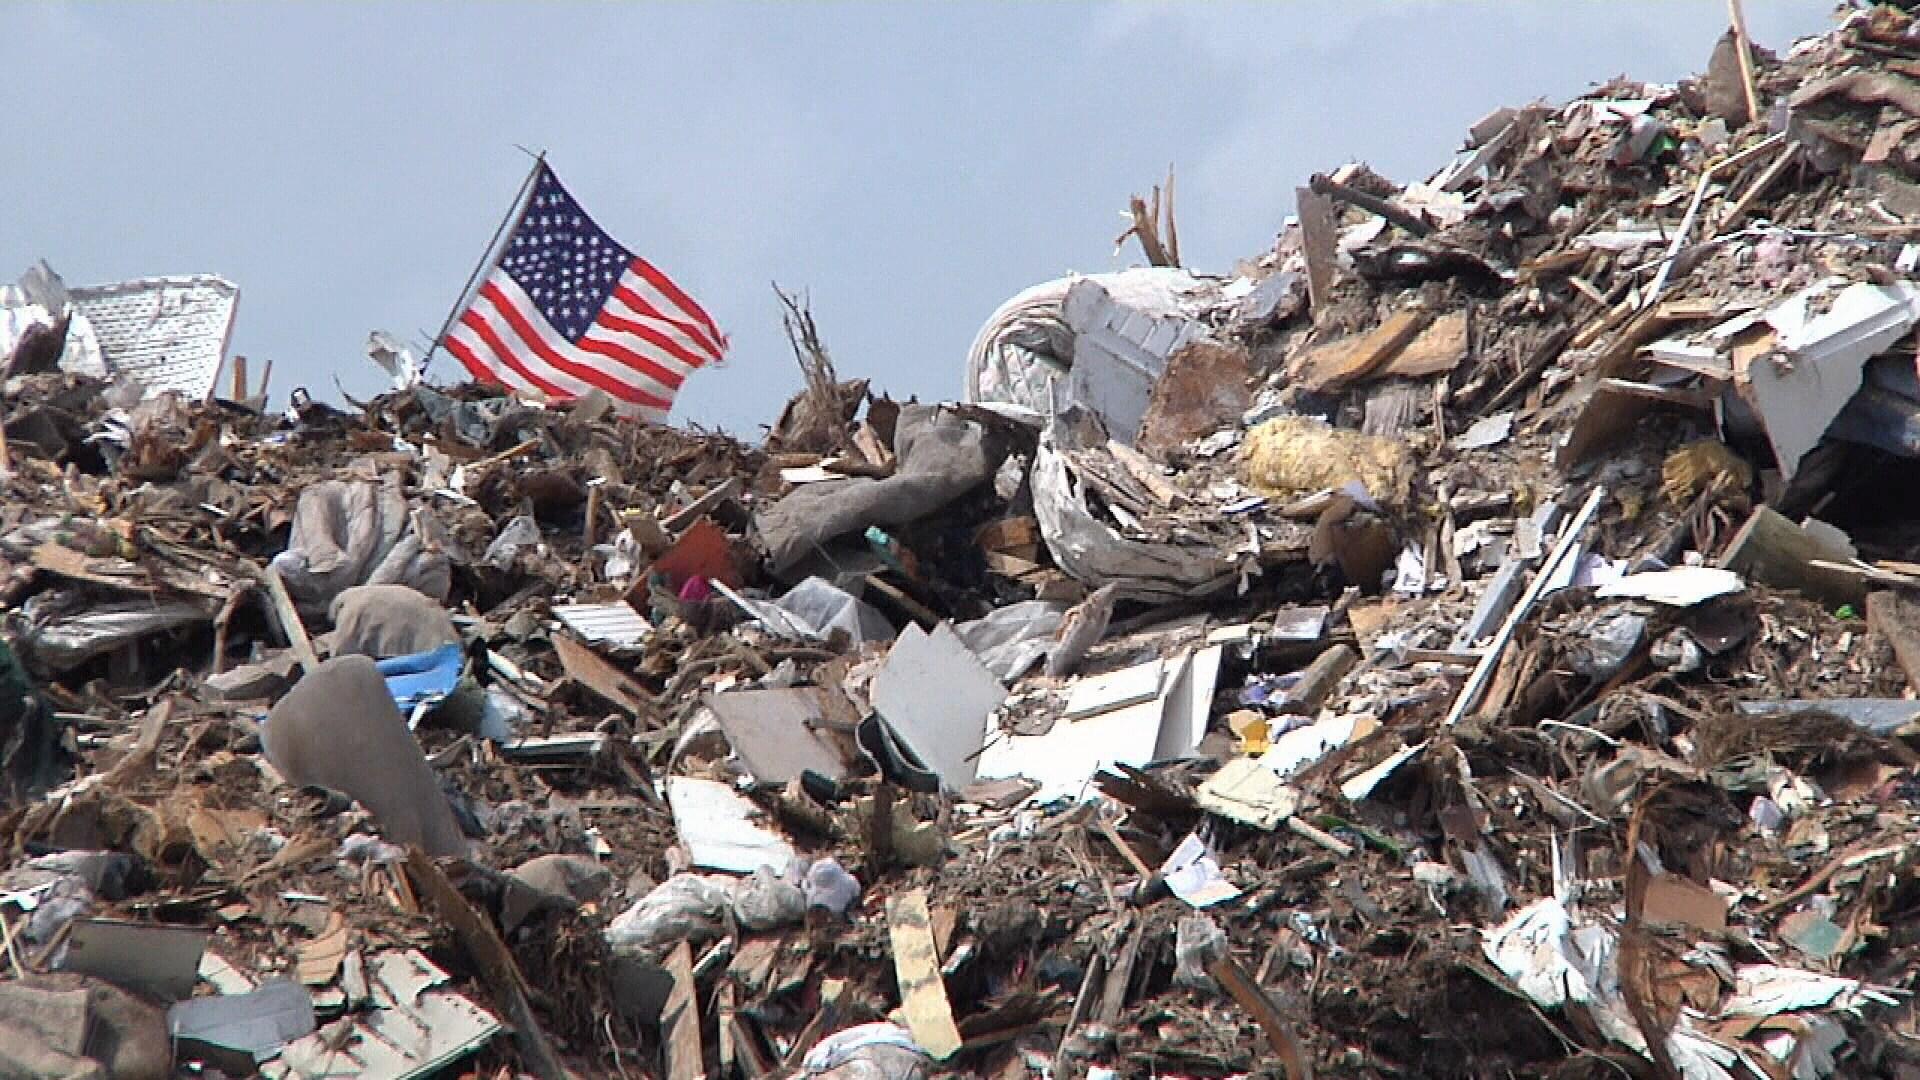 Hurricane Harvey left behind enough debris in Port Aransas to fill the U.S. Capitol rotunda ten times.